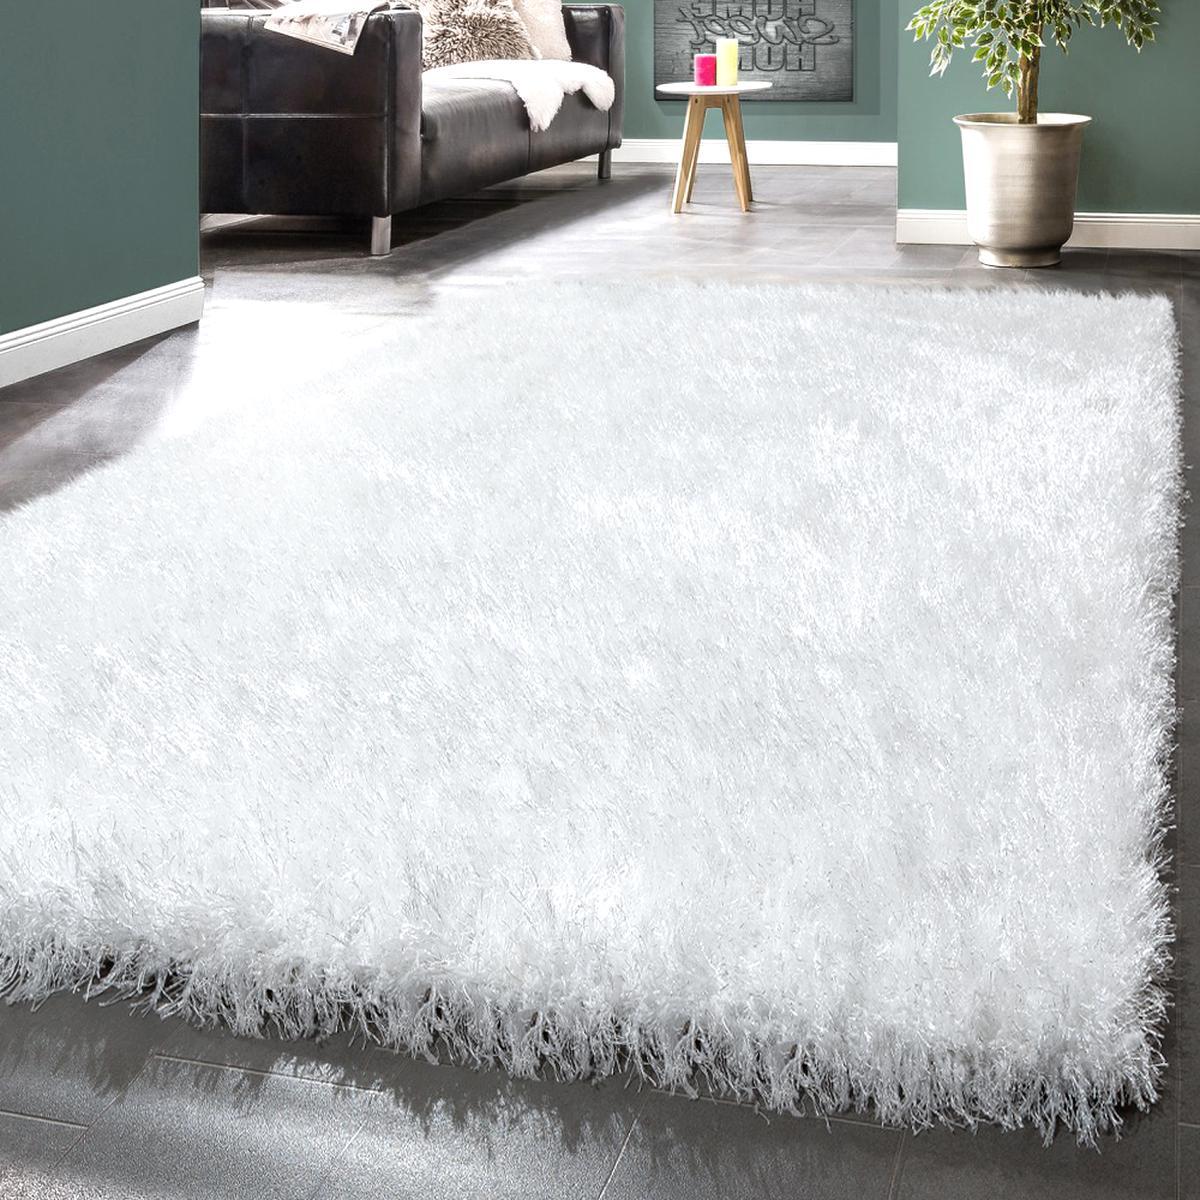 Tapis Long Poil Blanc tapis poil long blanc d'occasion